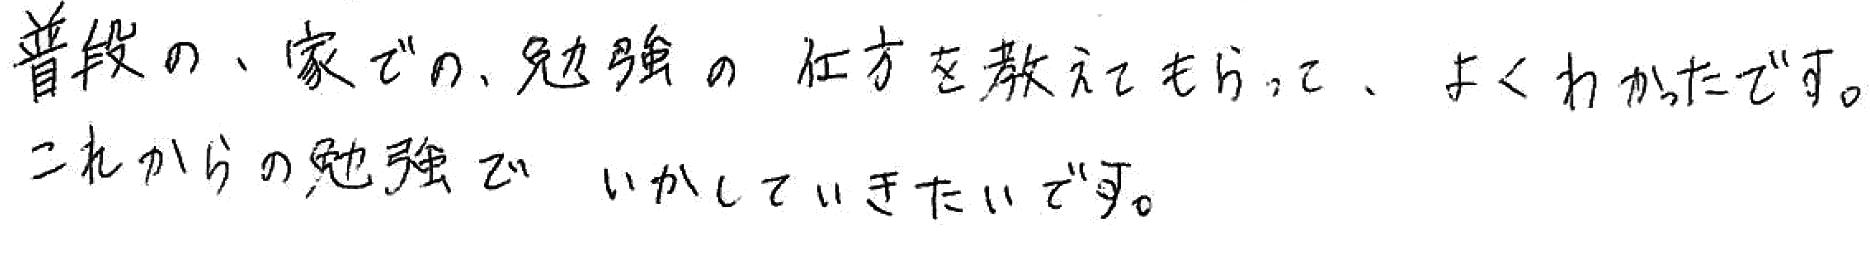 Mちゃん(中1)(今治市)からの口コミ